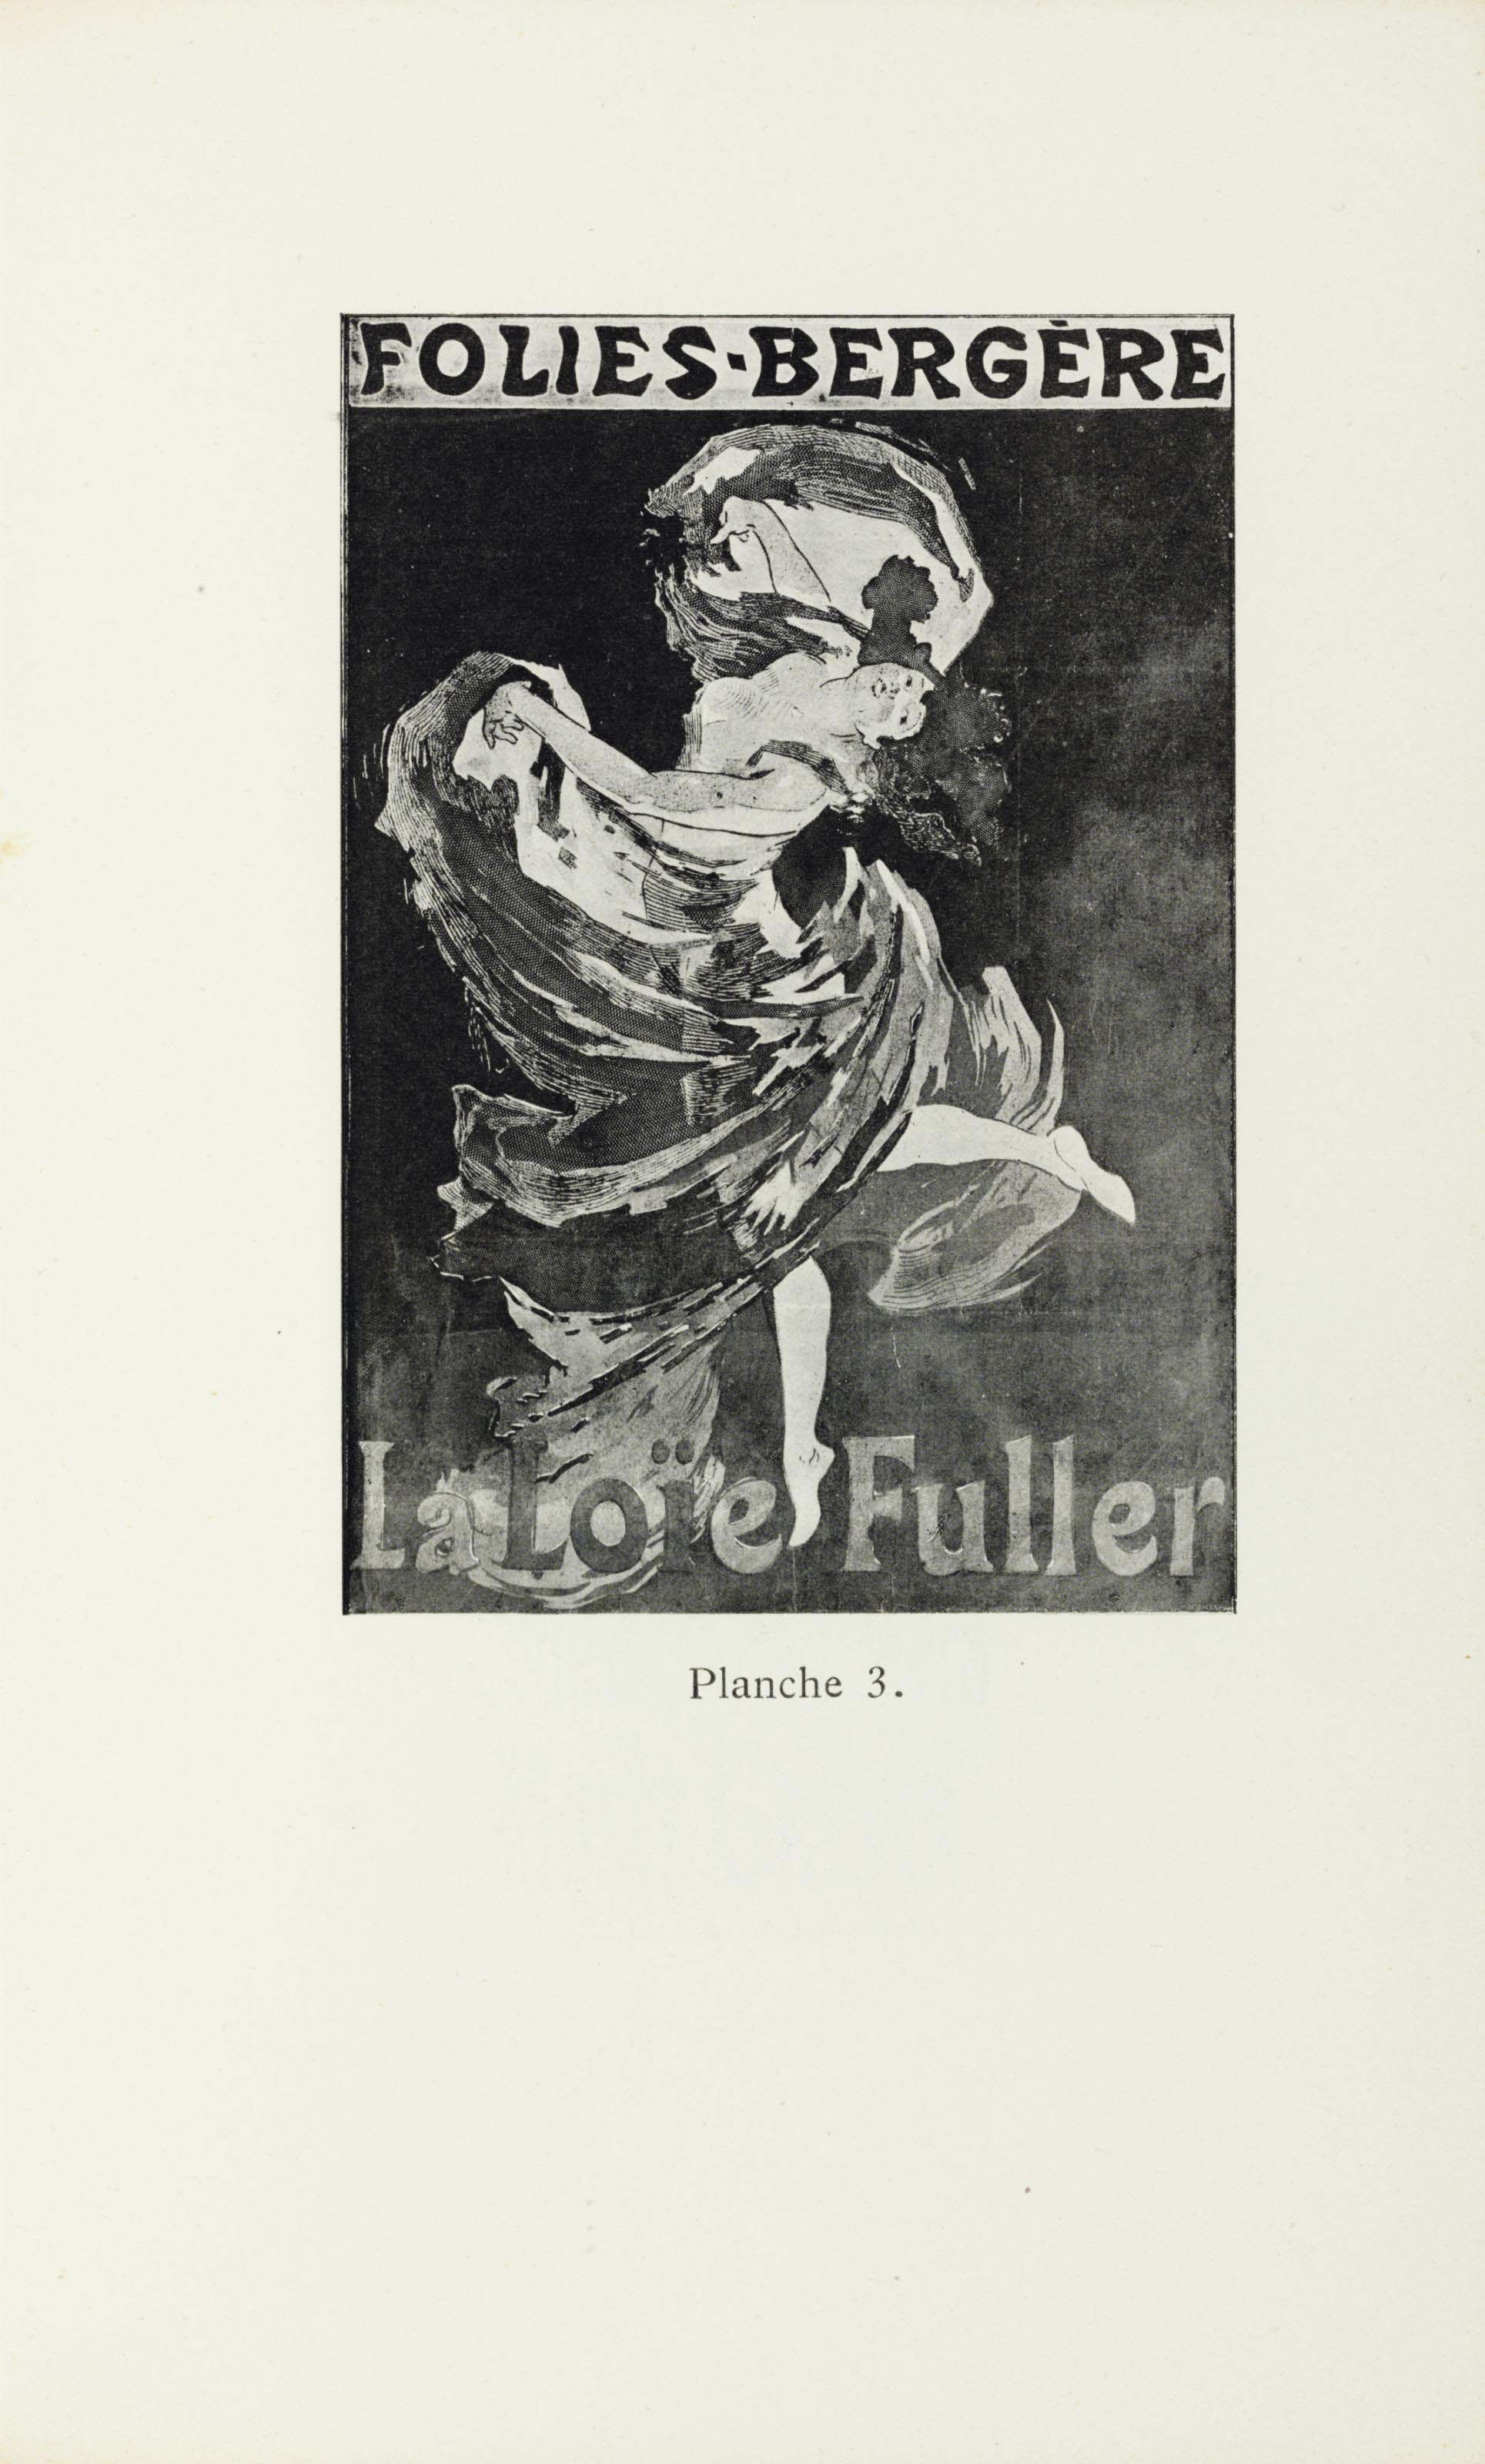 RYSSELBERGHE, Theo van (1862-1926), illustrator -- FLÉ, Georges. Poesies mises en musique. Paris and Brussels: Mercure de France, printed by Vanderauwera et Monnom, 1898.